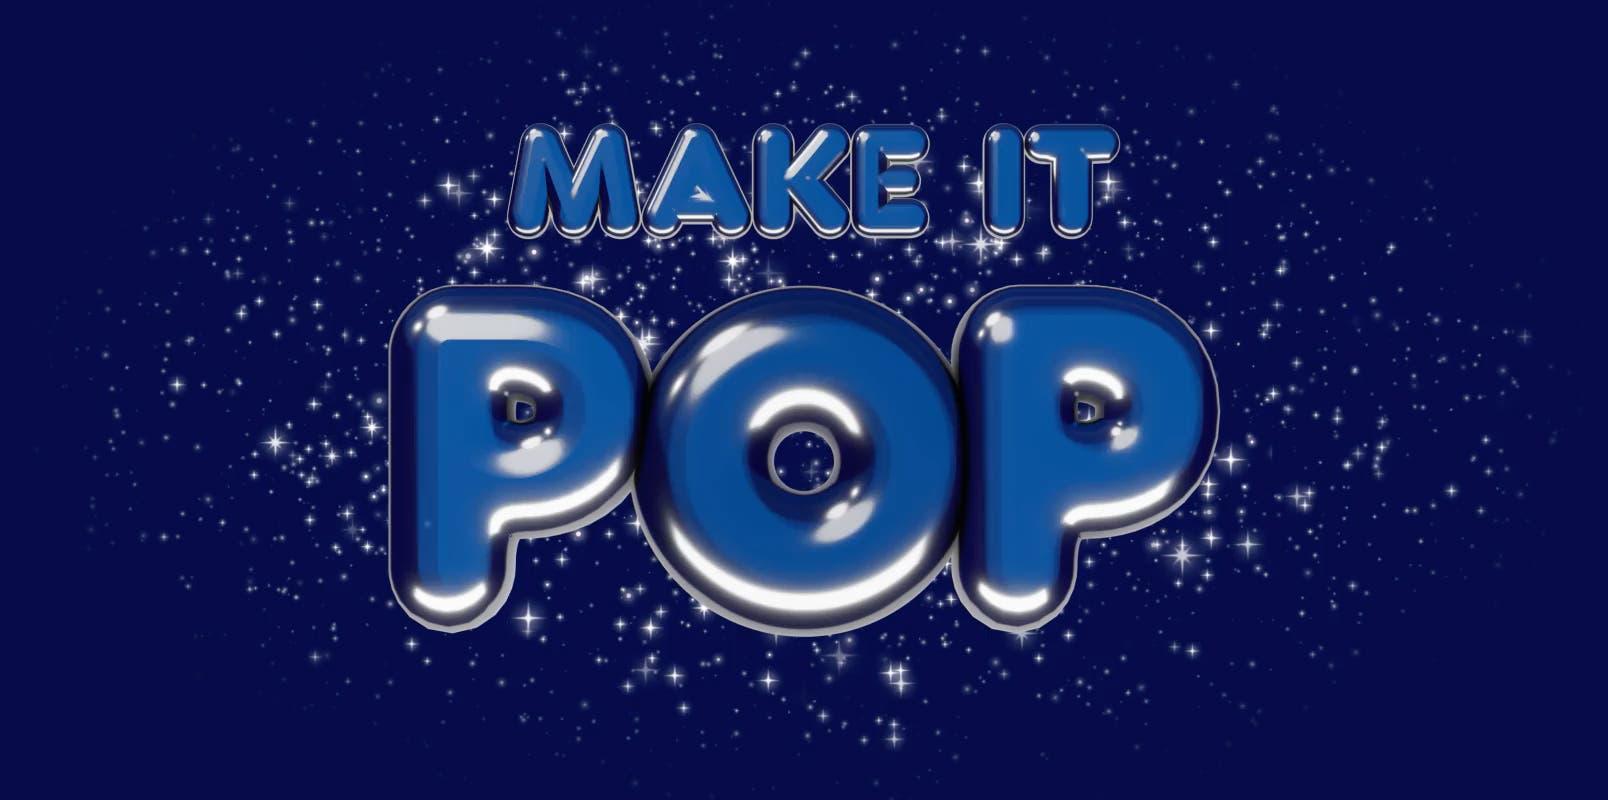 Make It Pop-In@Nordstrom.